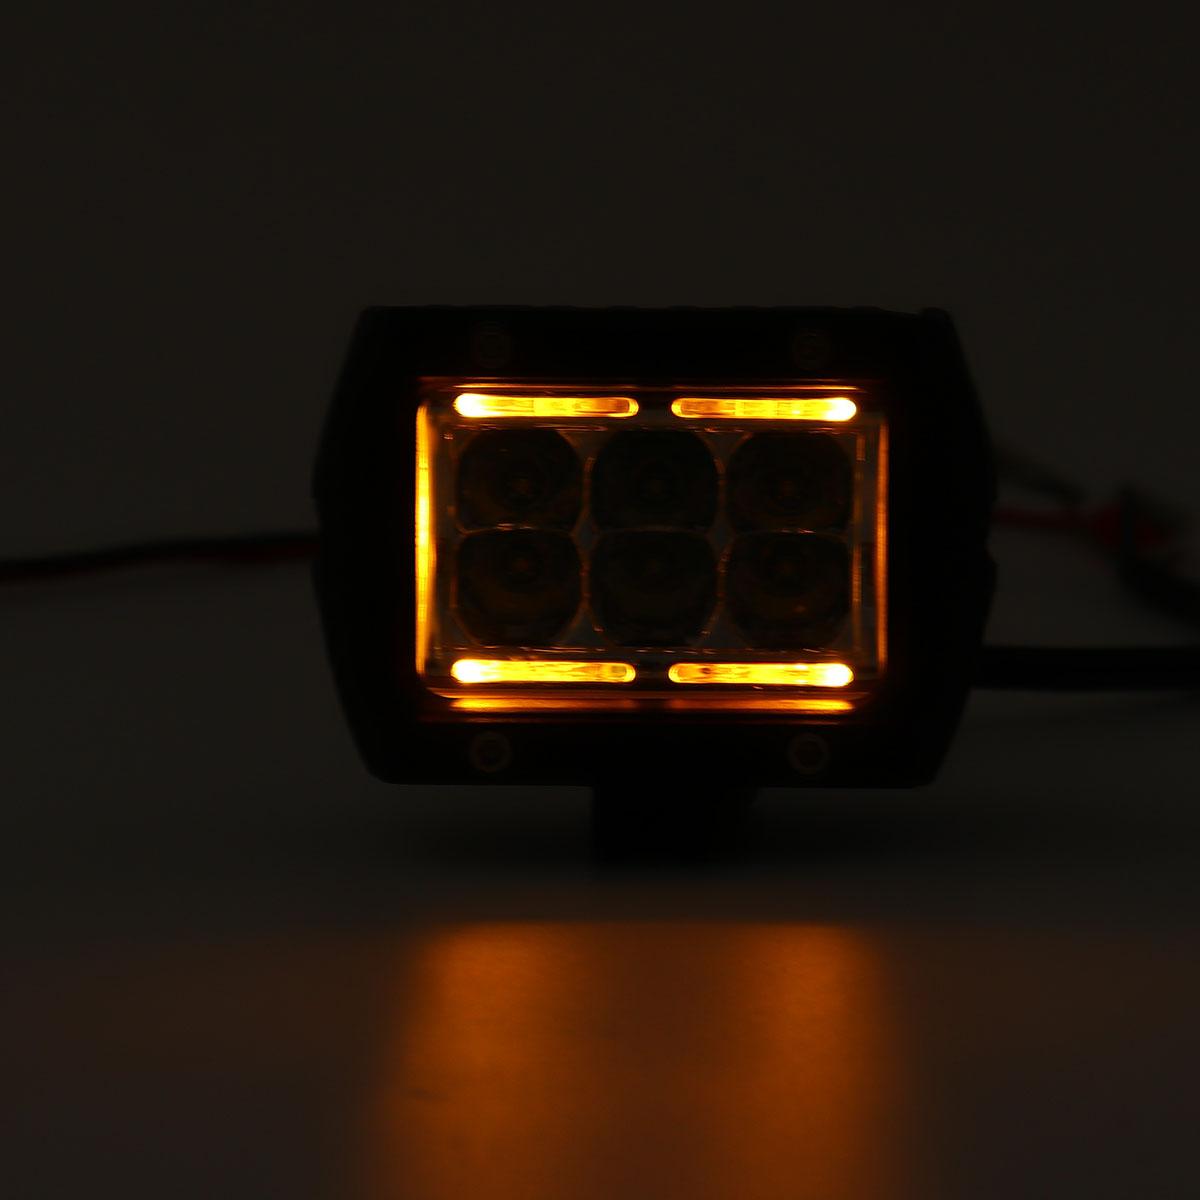 4'' Inch 60W LED Work Light Bar Spot Flood Combo Beam Offroad Car Truck Boat Driving Lamp